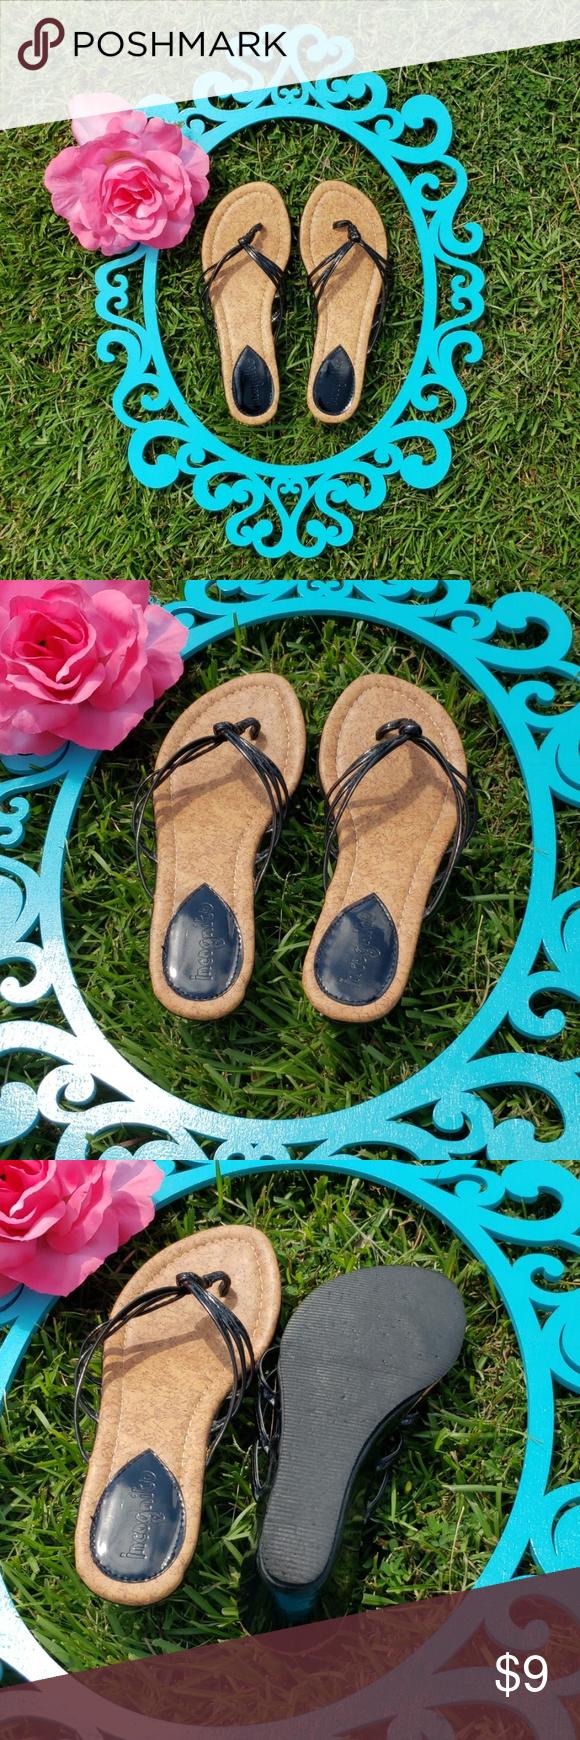 Incognito Flip Flops Clothes Design Flop Fashion Design